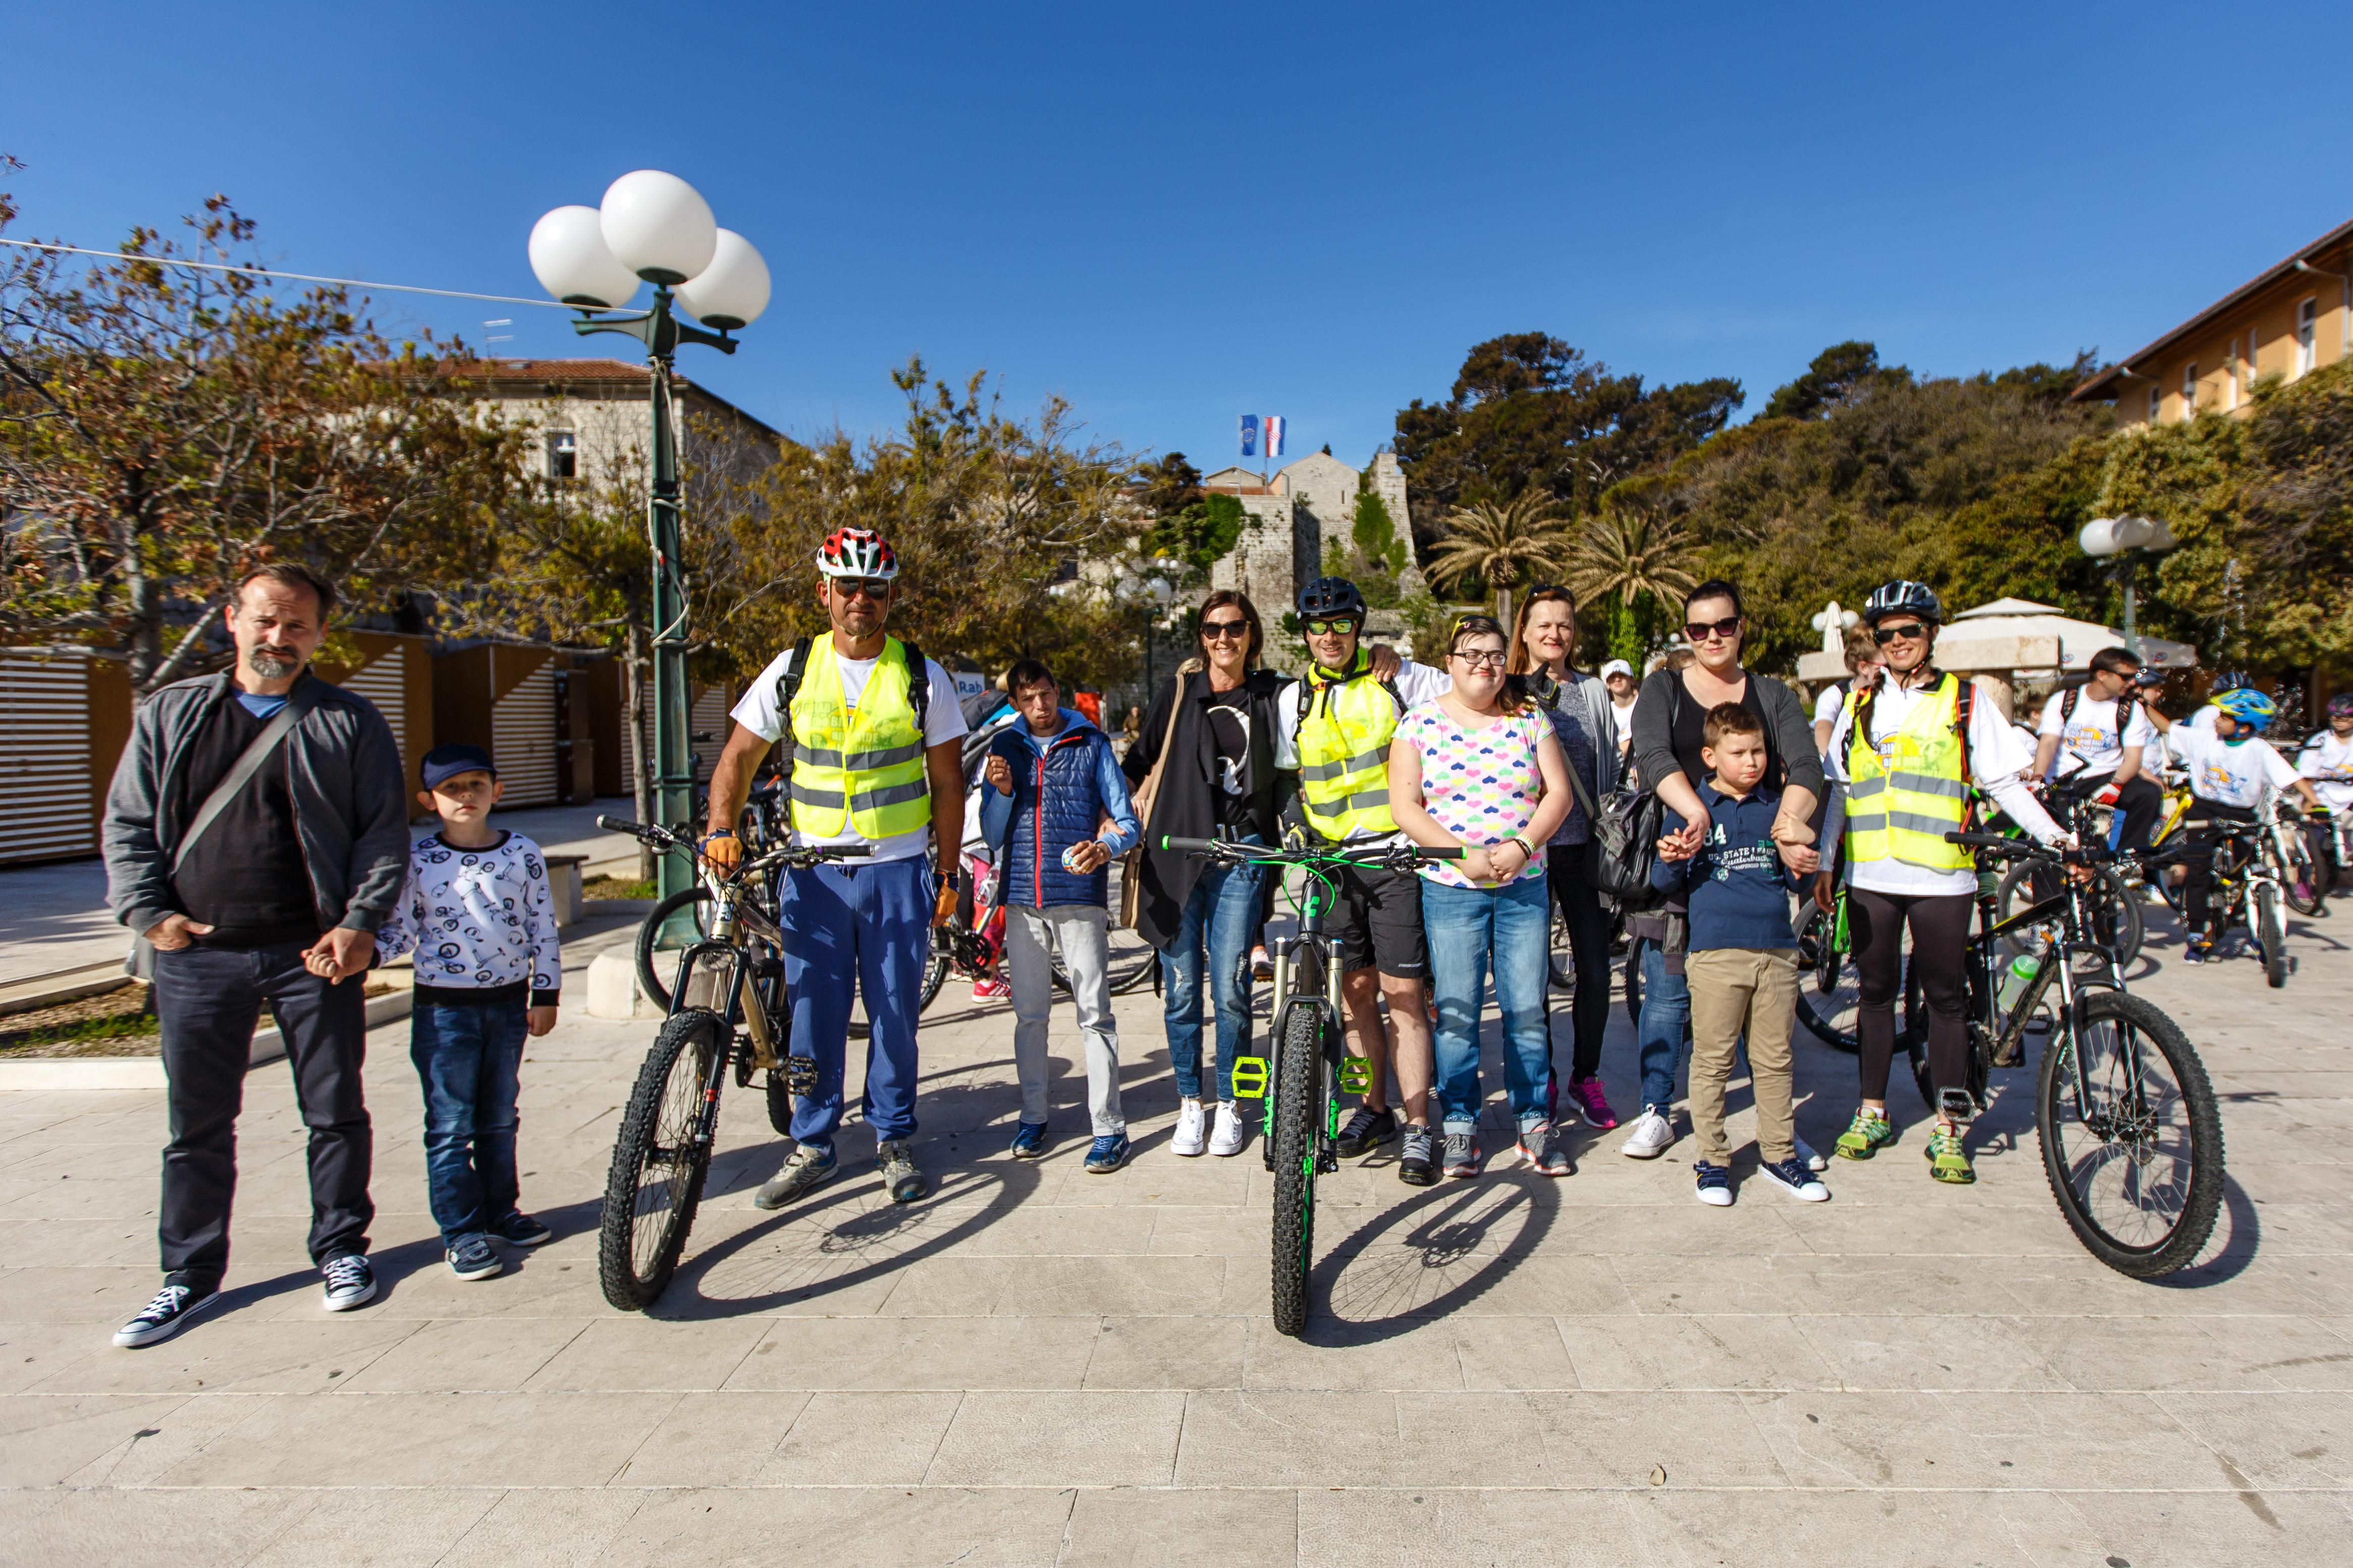 Biciklijada gRab the Bike and Ride 05.2017-15.jpg (2.63 MB)